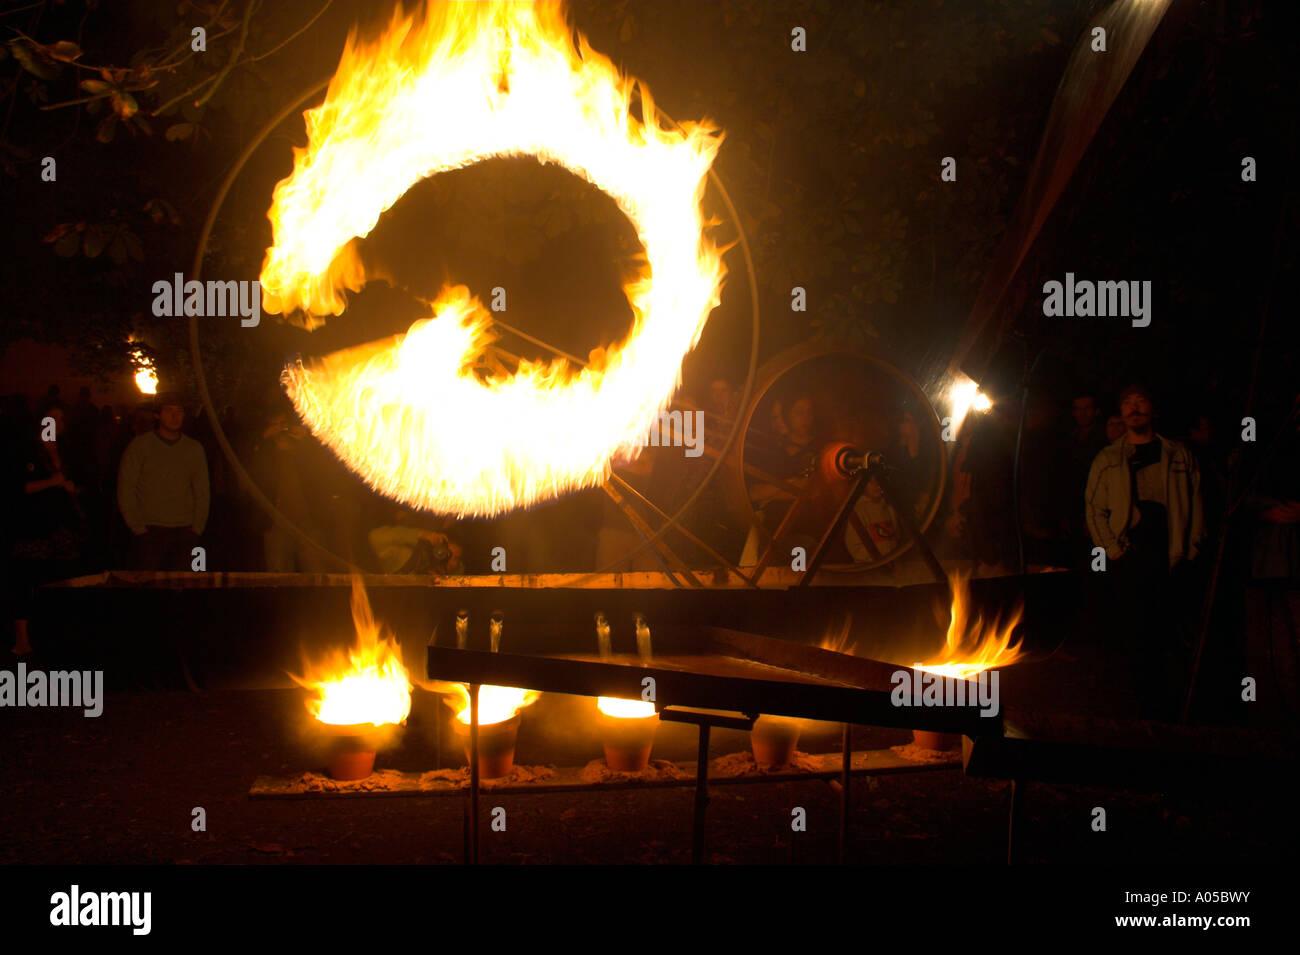 Wheel of fire, fire display, Platt Fields Park, Rusholme, Manchester, UK - Stock Image